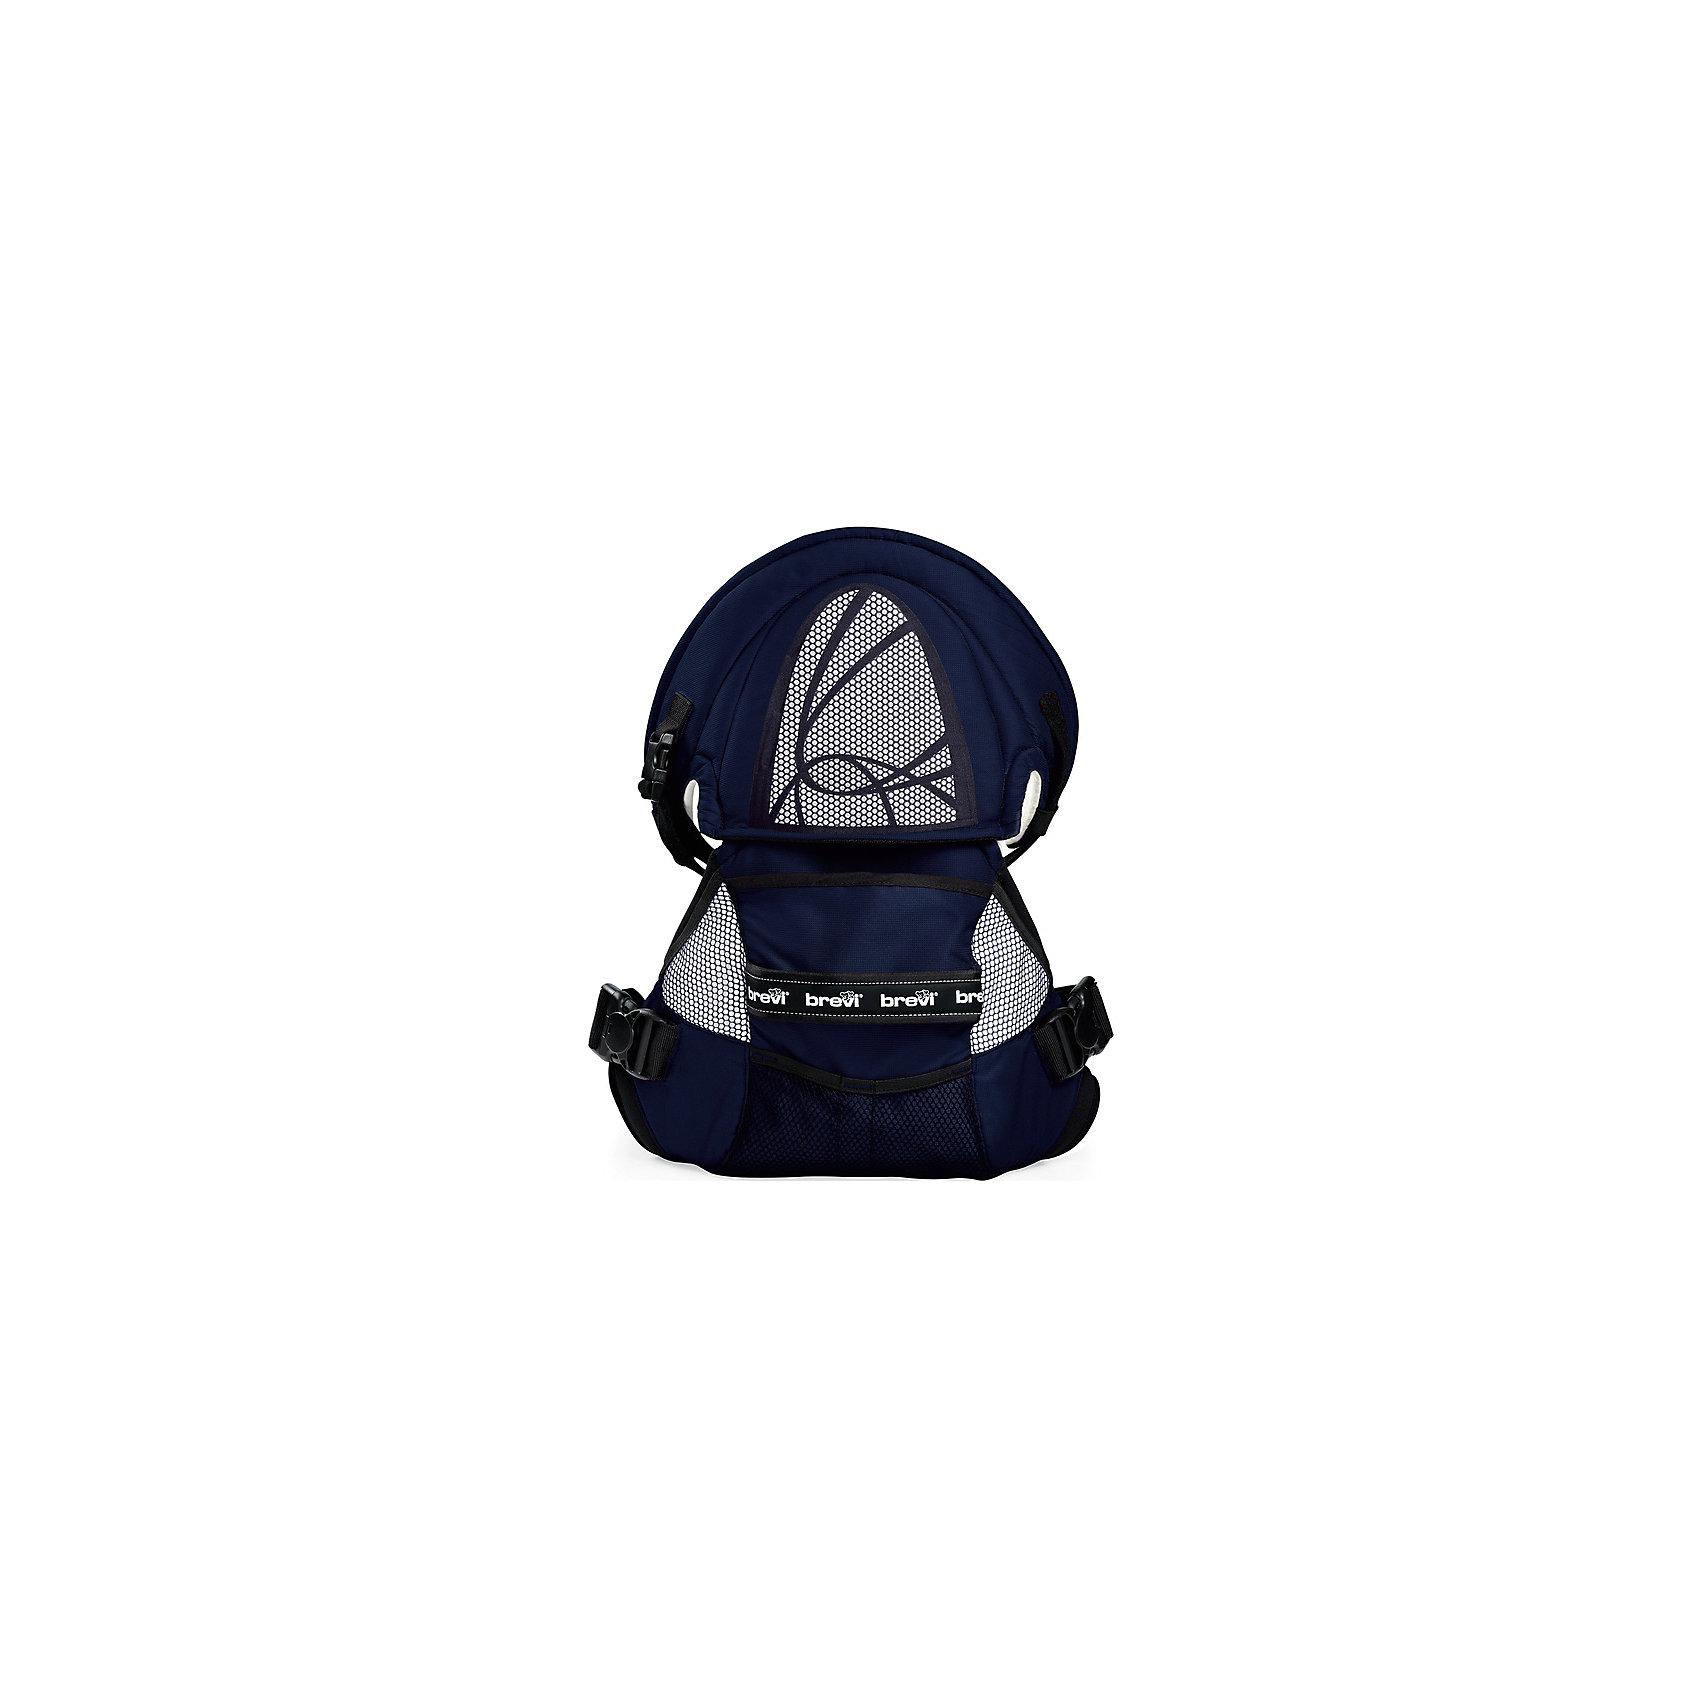 brevi Рюкзачок для переноски детей Pod (015/239), Brevi, темно-синий ванна детская brevi 566 064